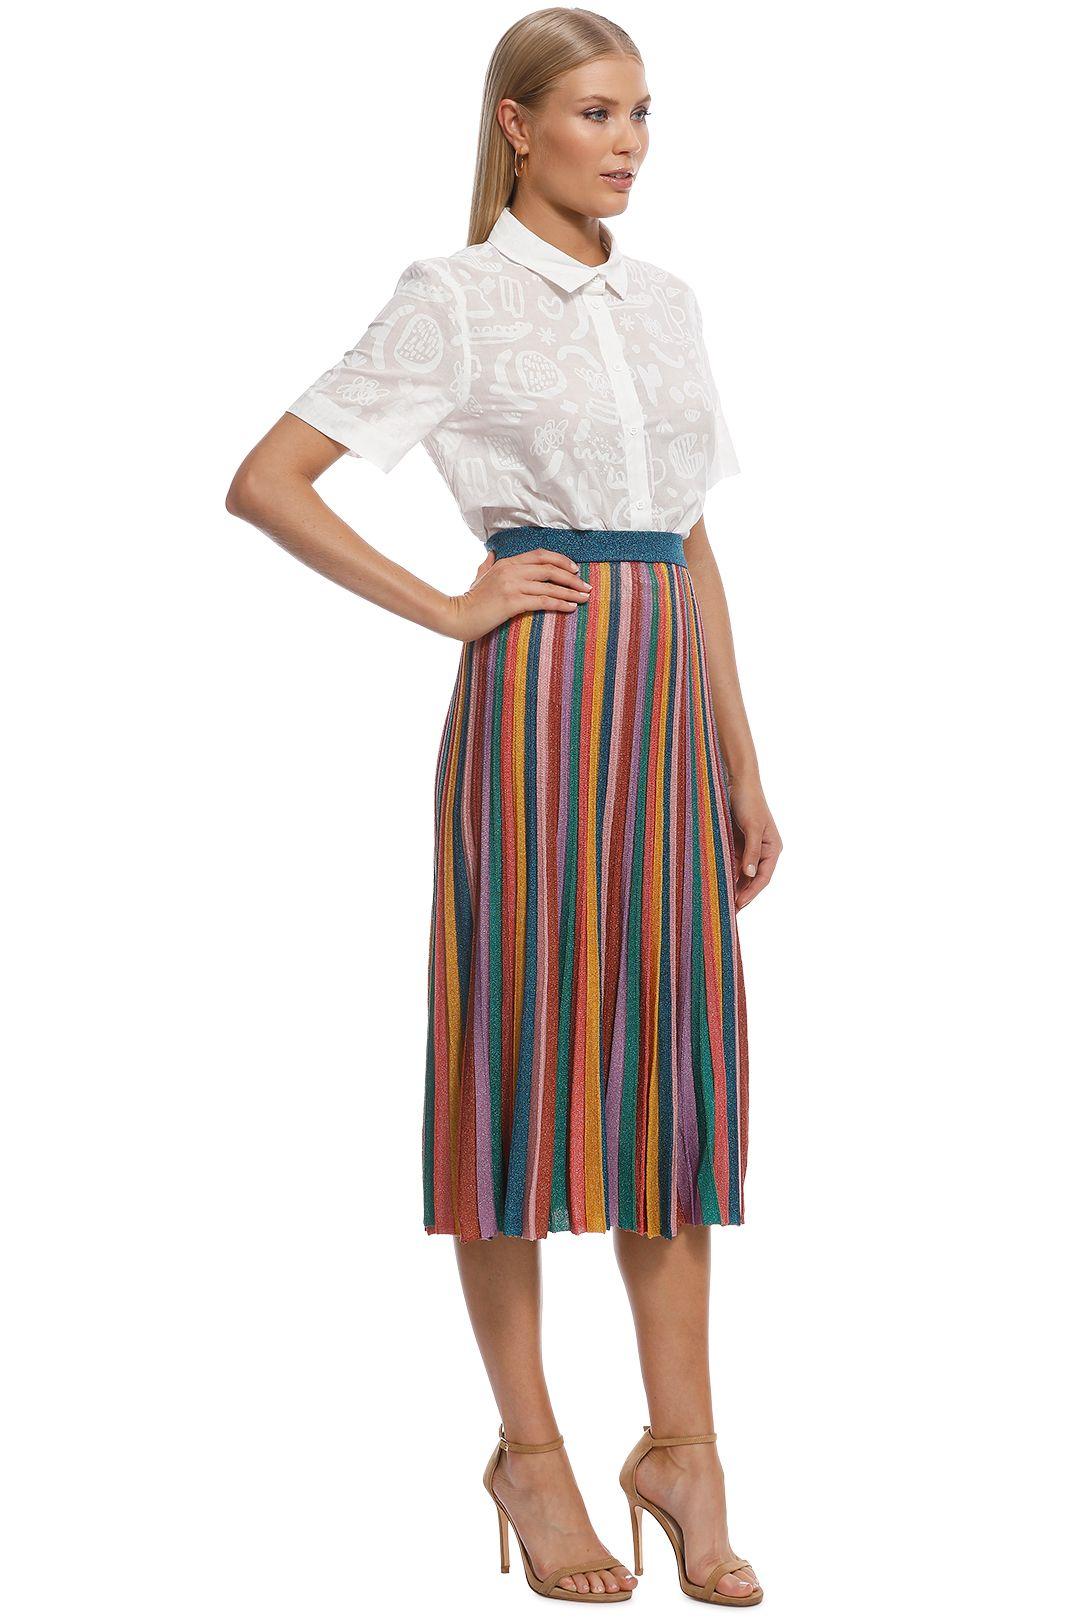 Gorman - Rainbow Knit Skirt - Multi - Side